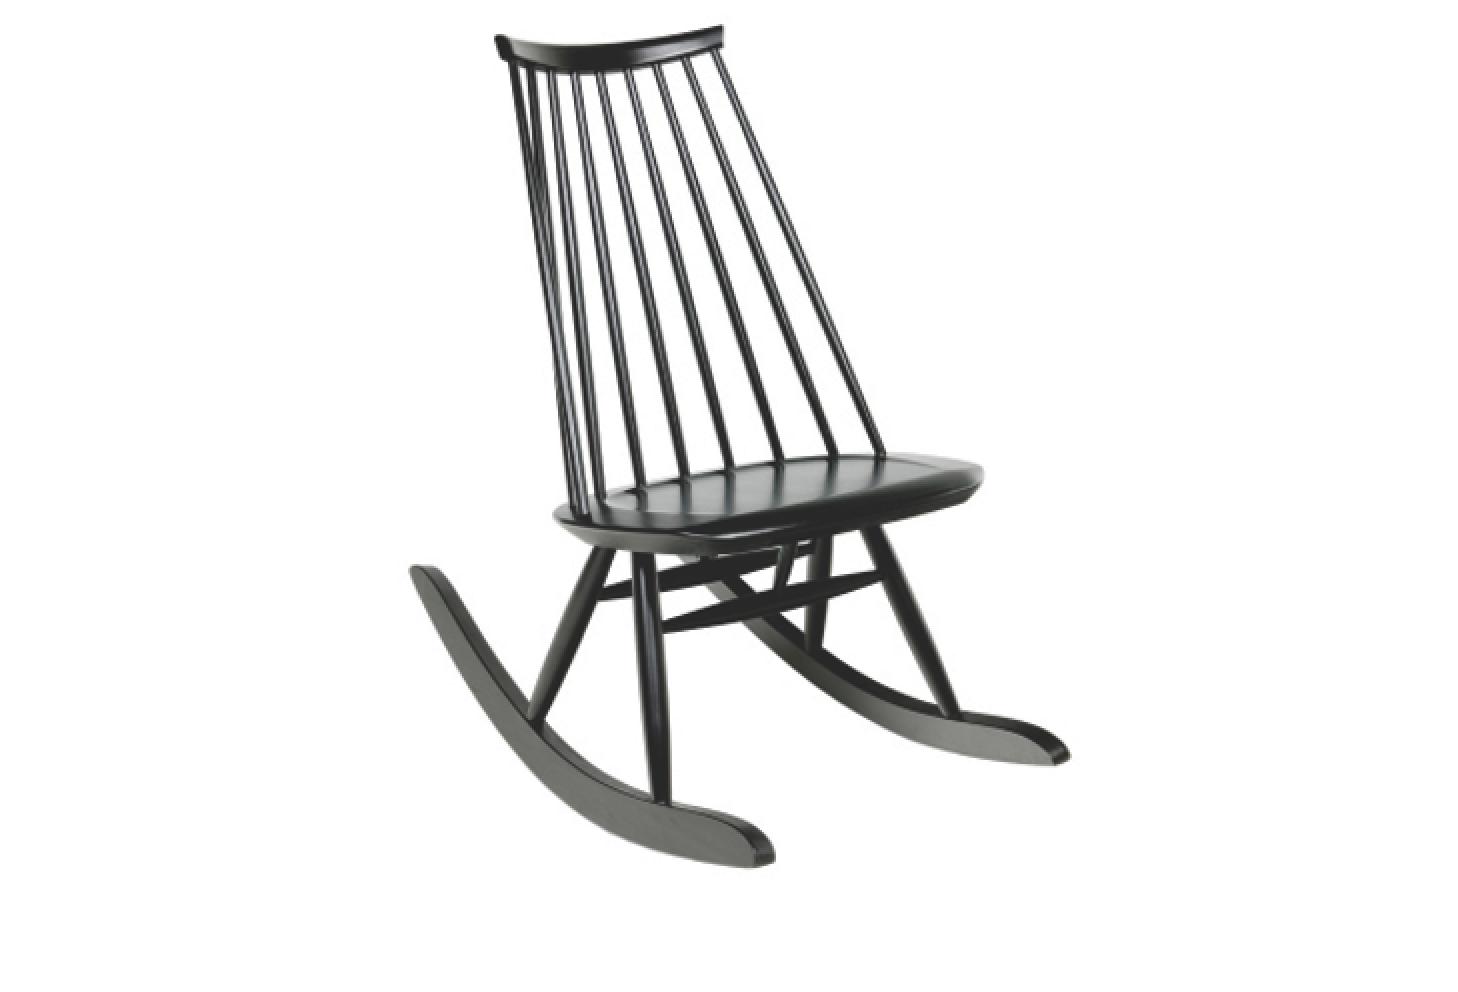 mademoiselle rocking chair remodelista 1 12